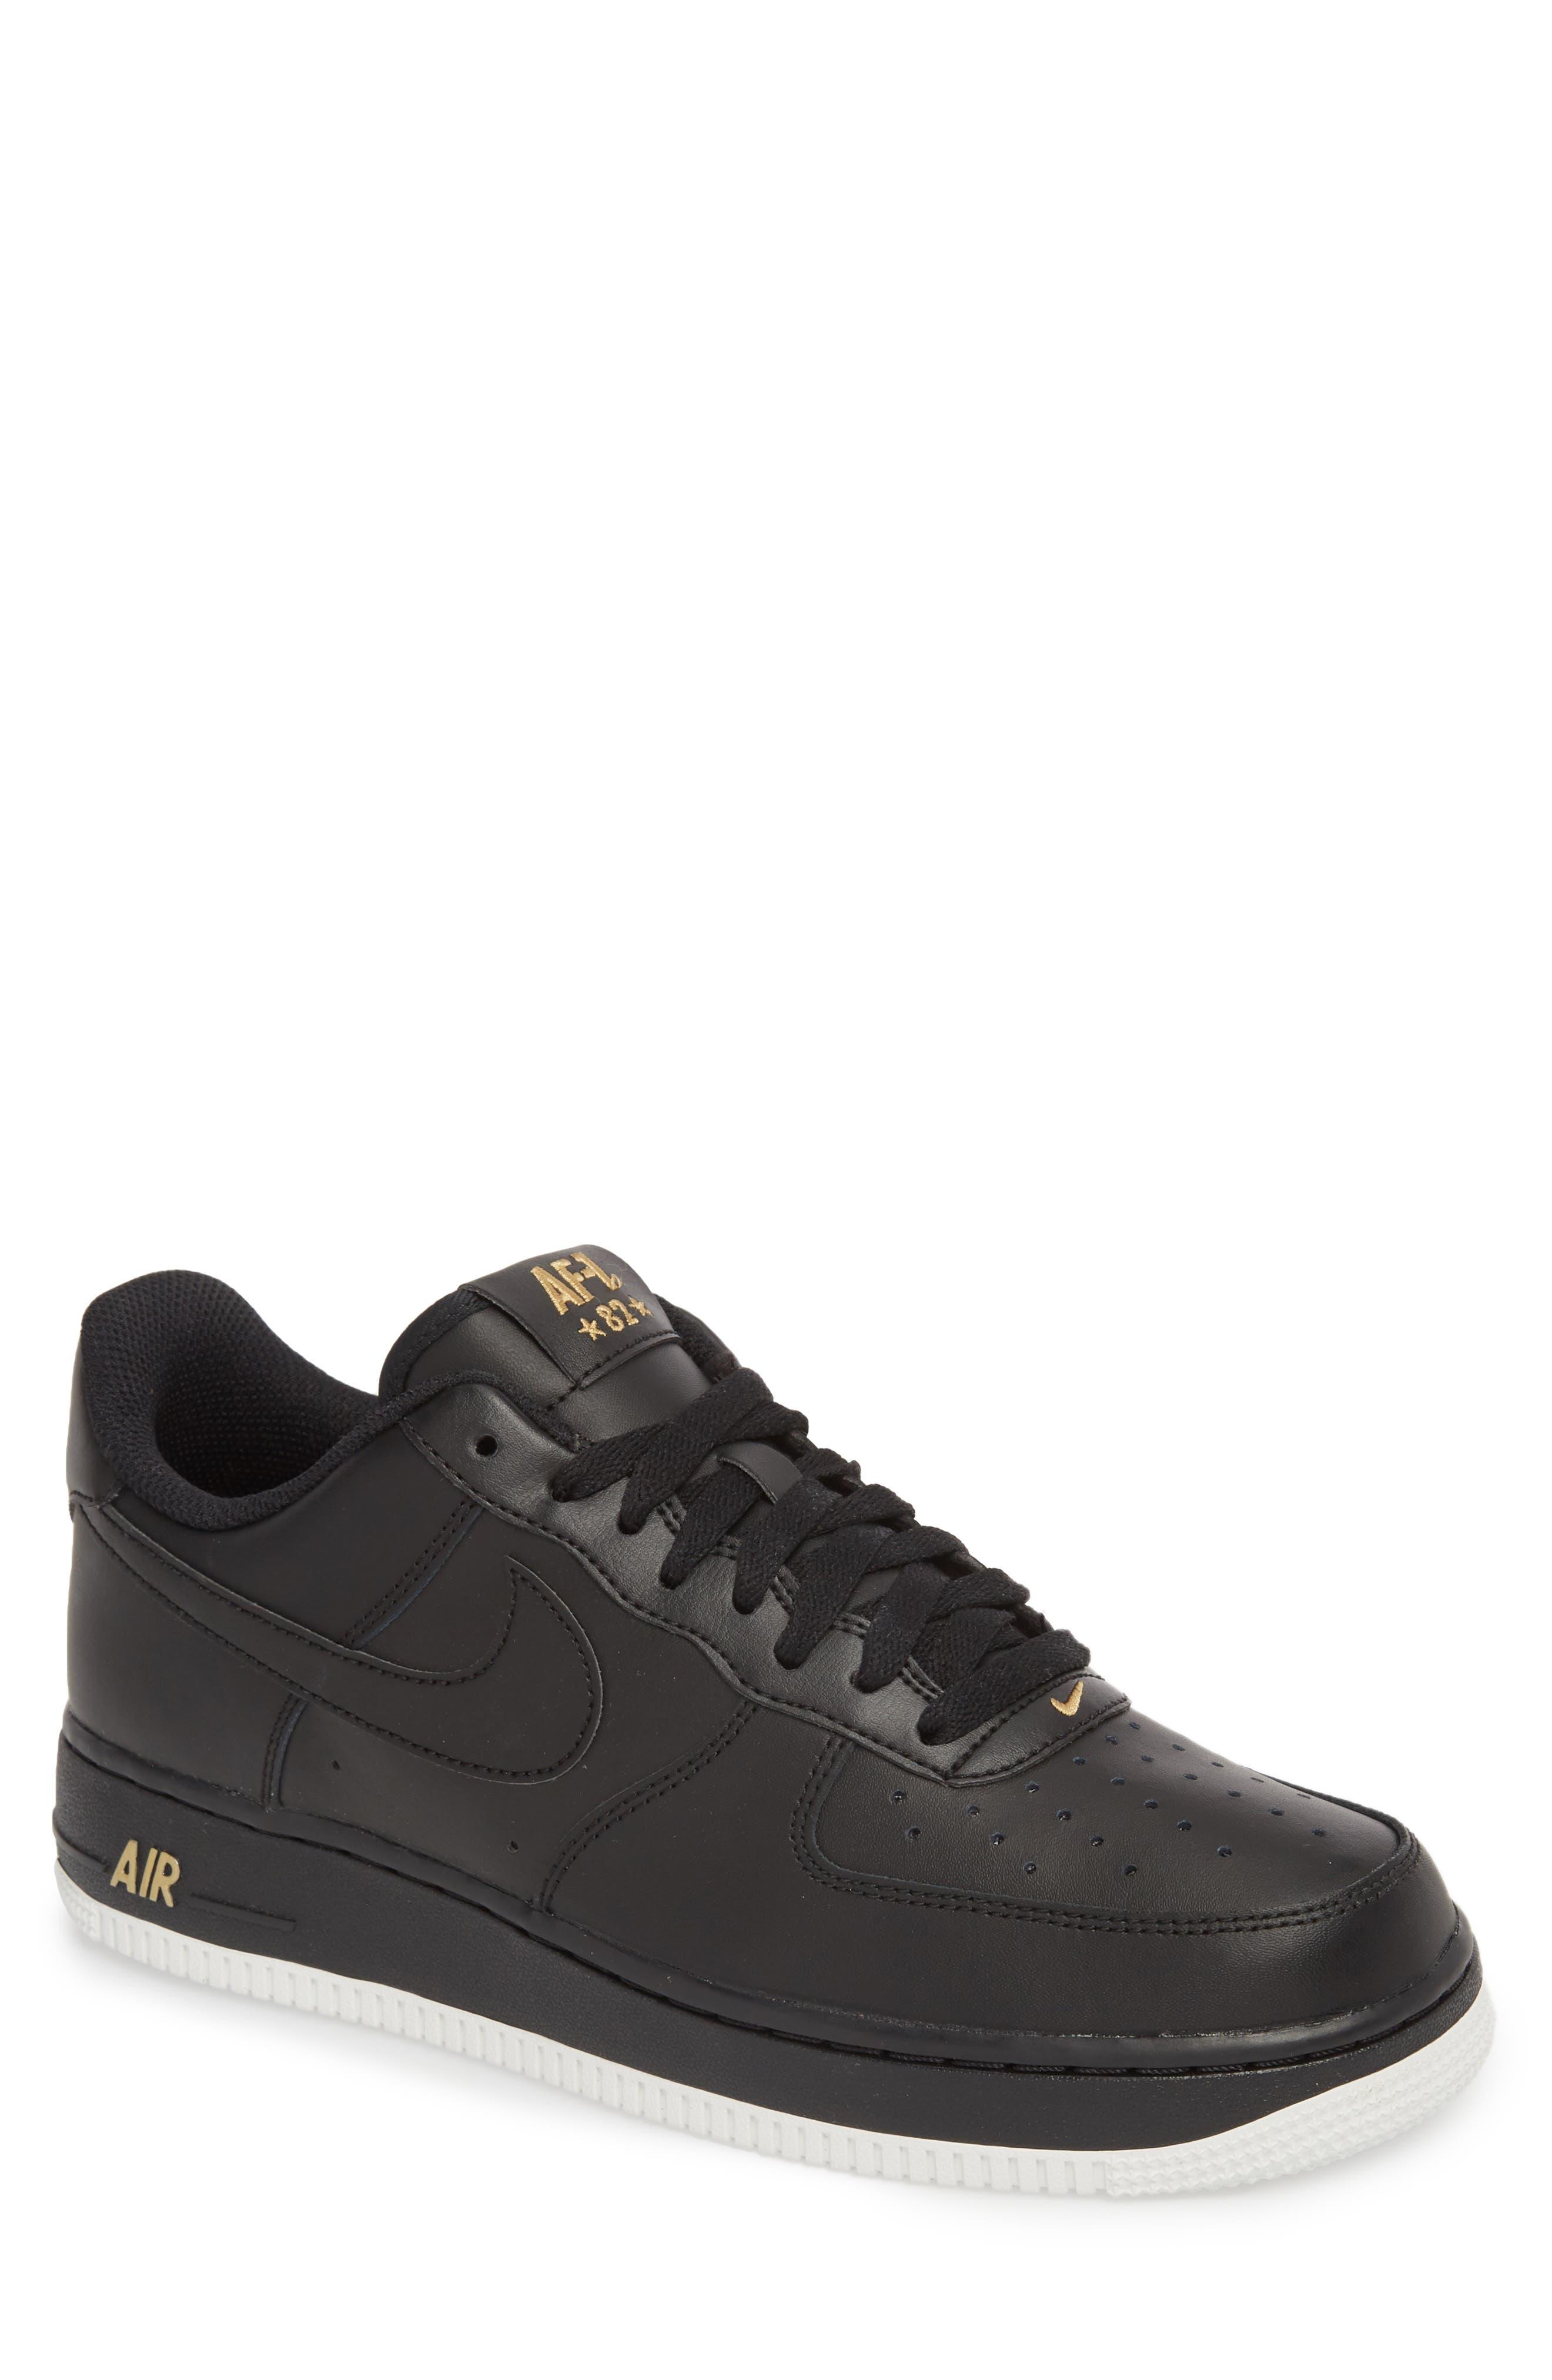 Air Force 1 07 Sneaker,                             Main thumbnail 1, color,                             014